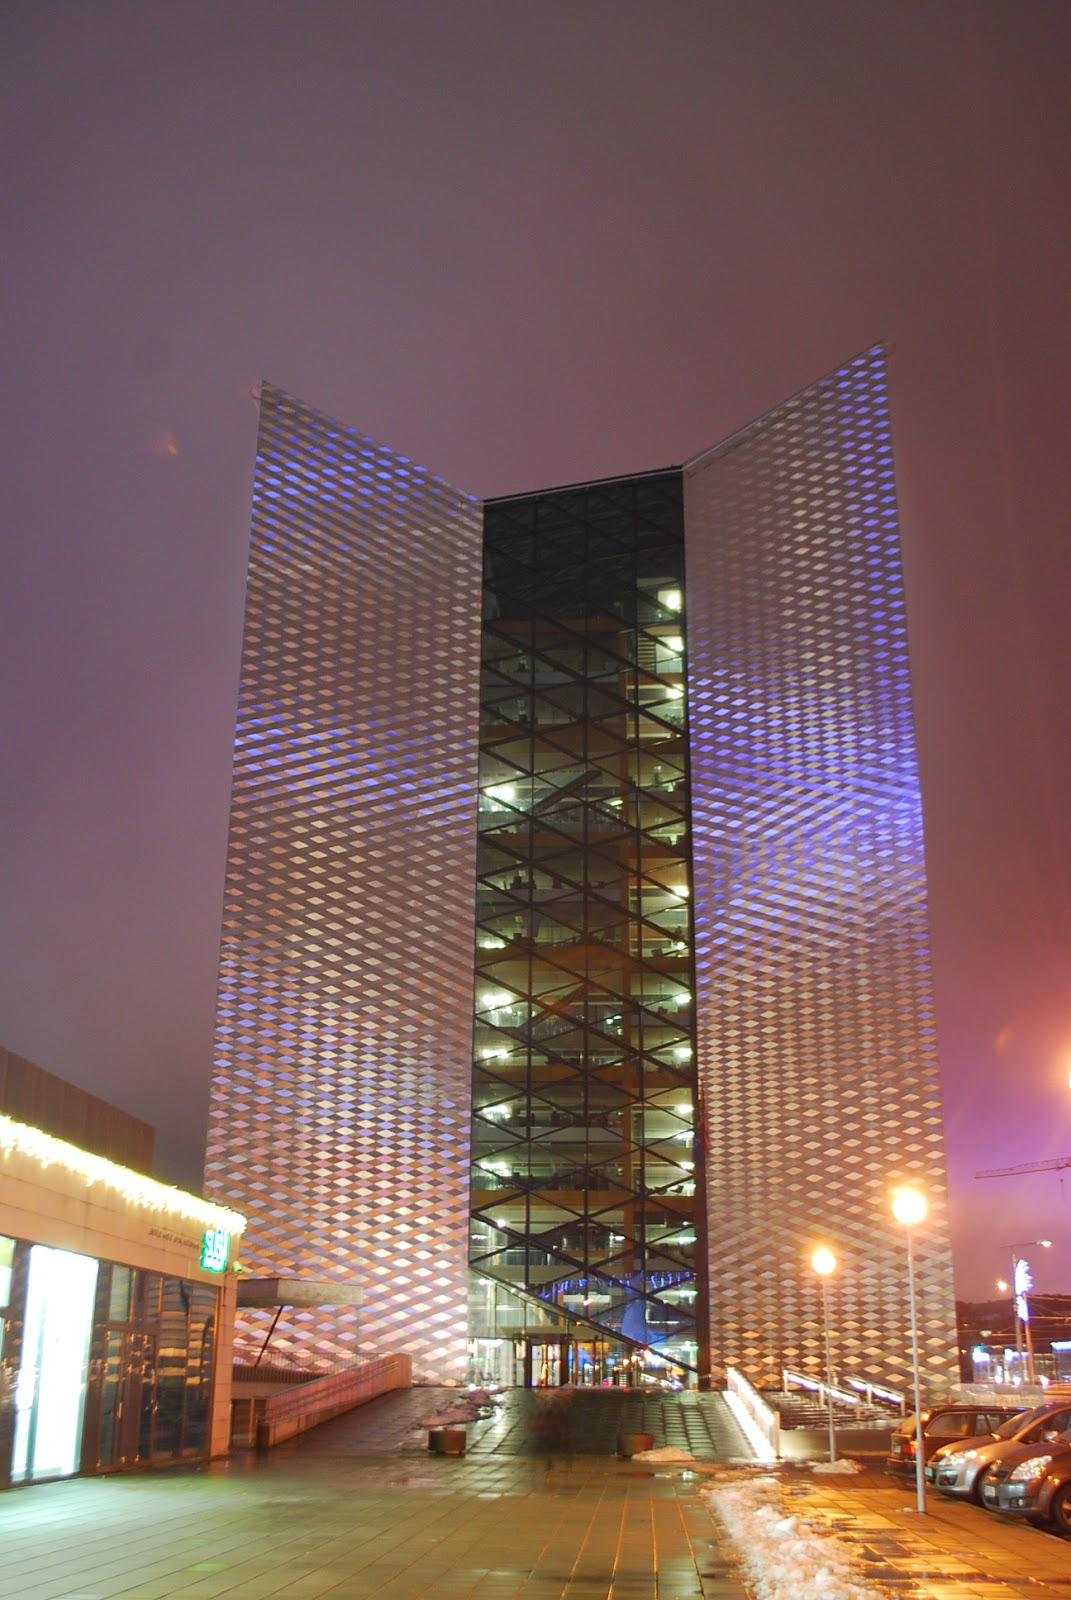 Сведбанк, Вильнюс, Литва. Swedbank. Vilnius, Lithuania